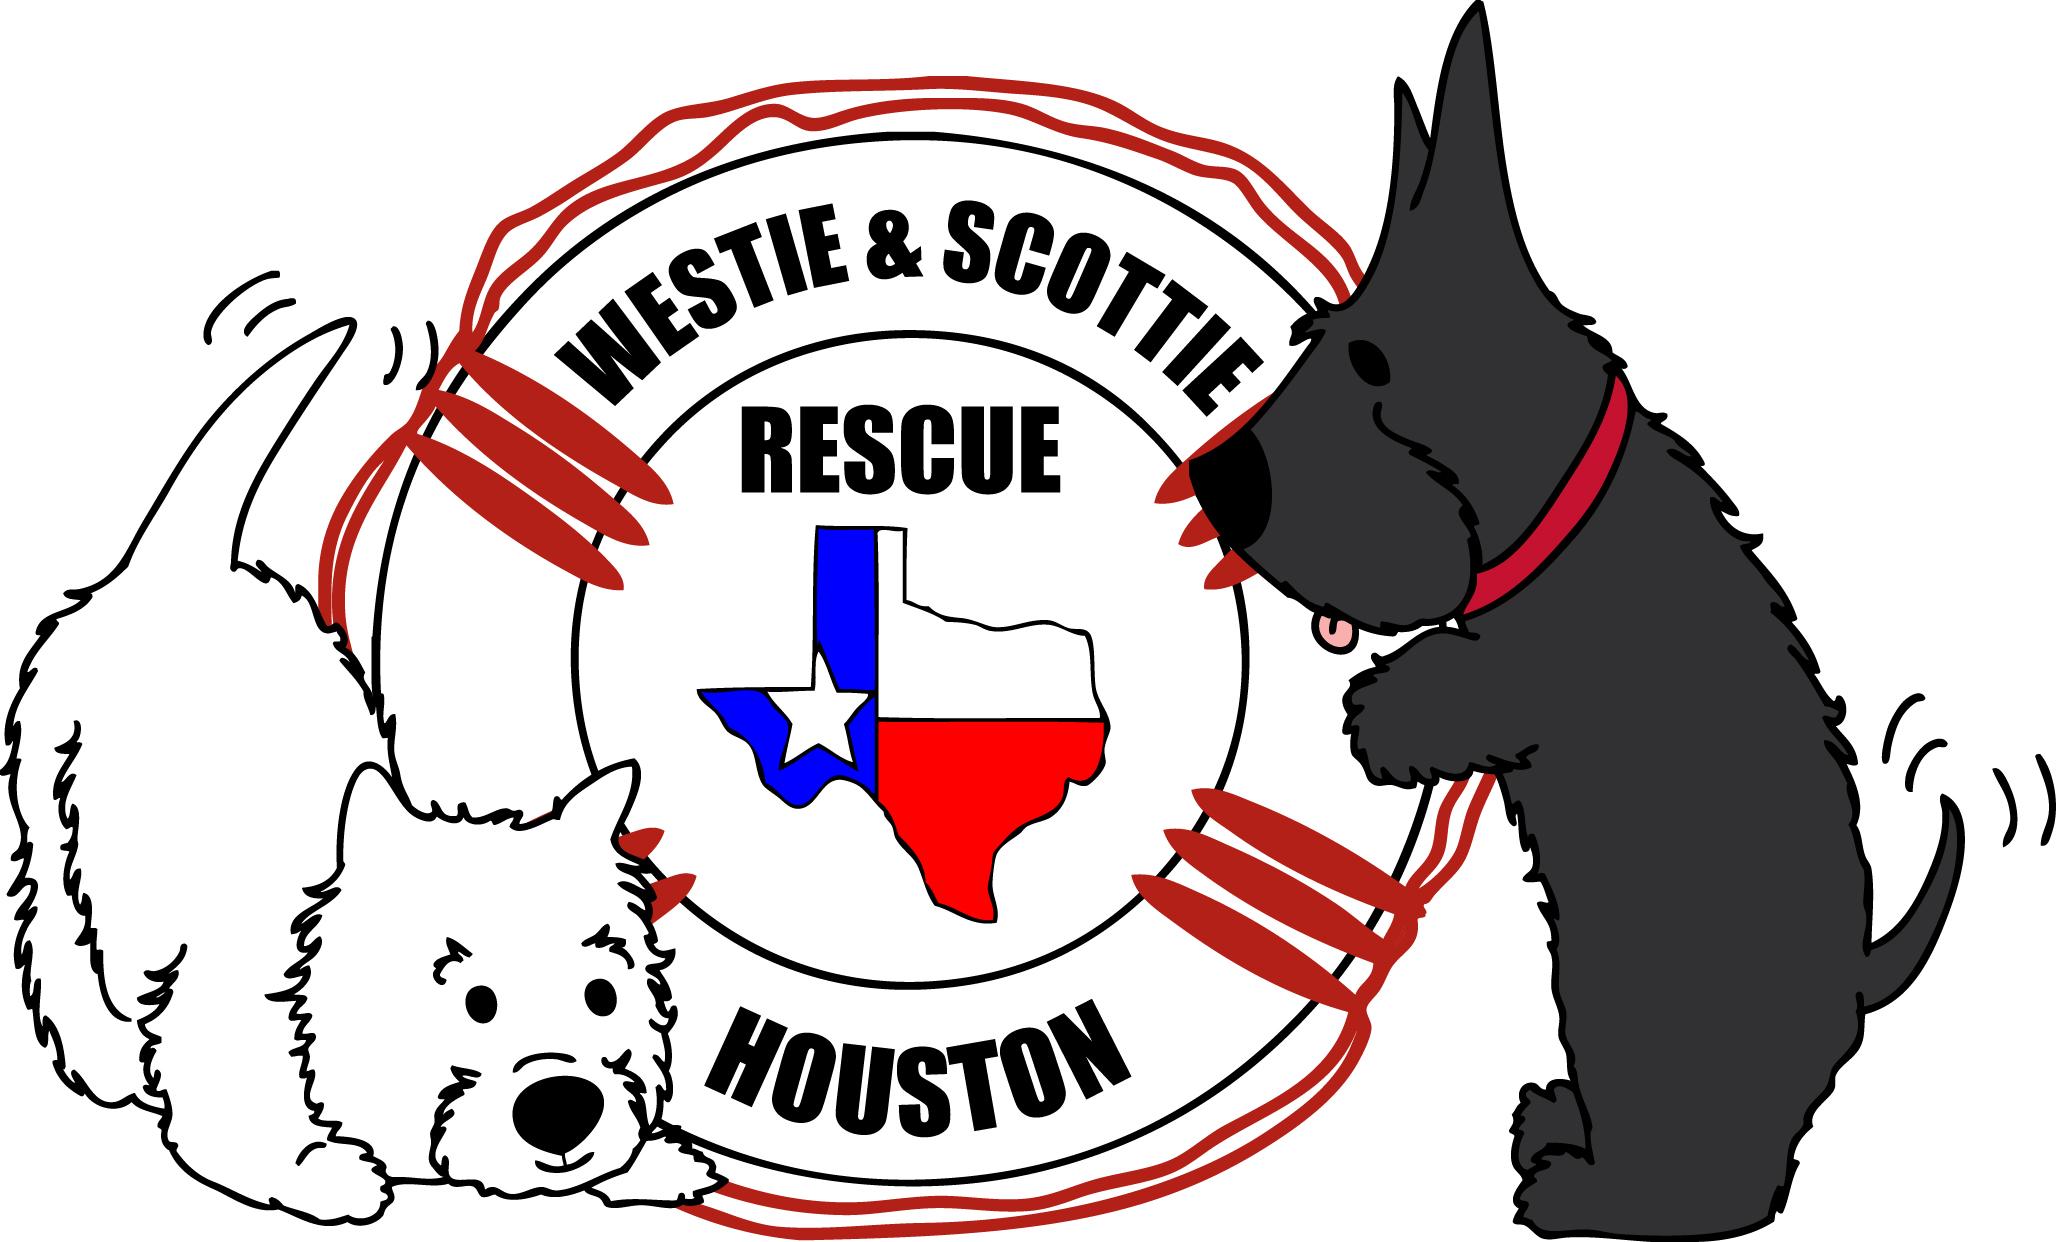 Westie & Scottie Rescue Houston